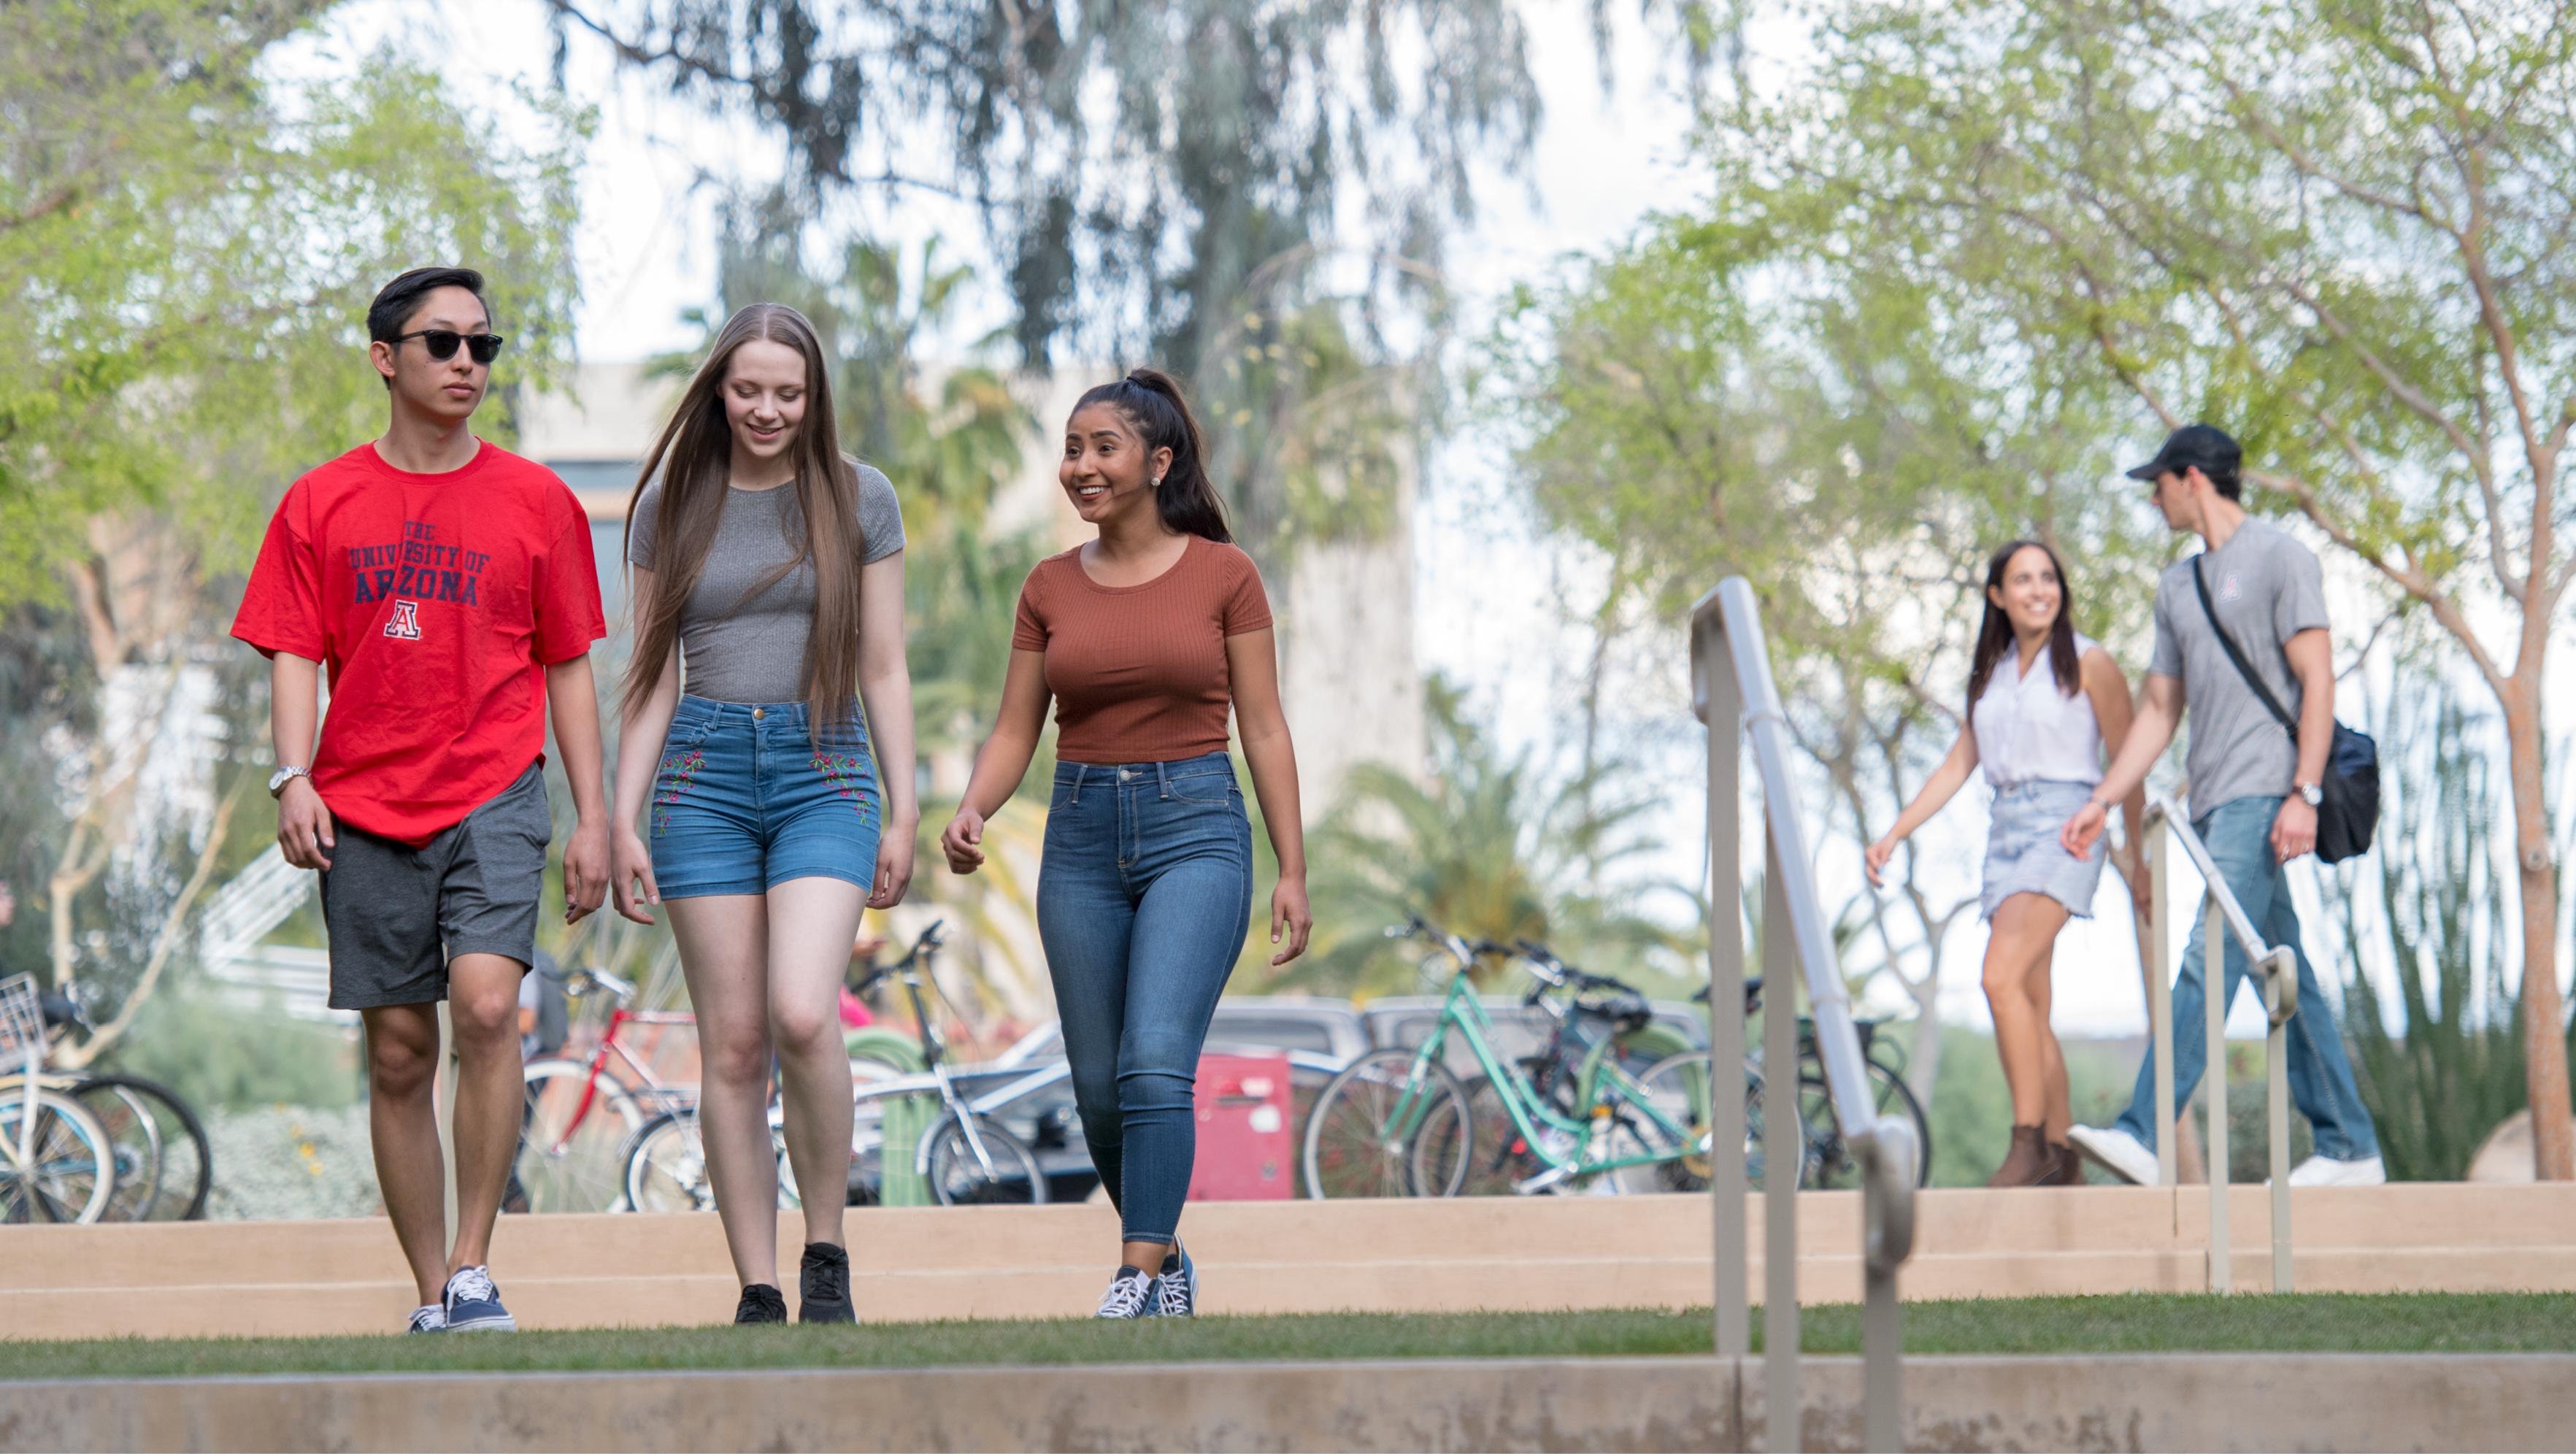 Three students in casual wear walking